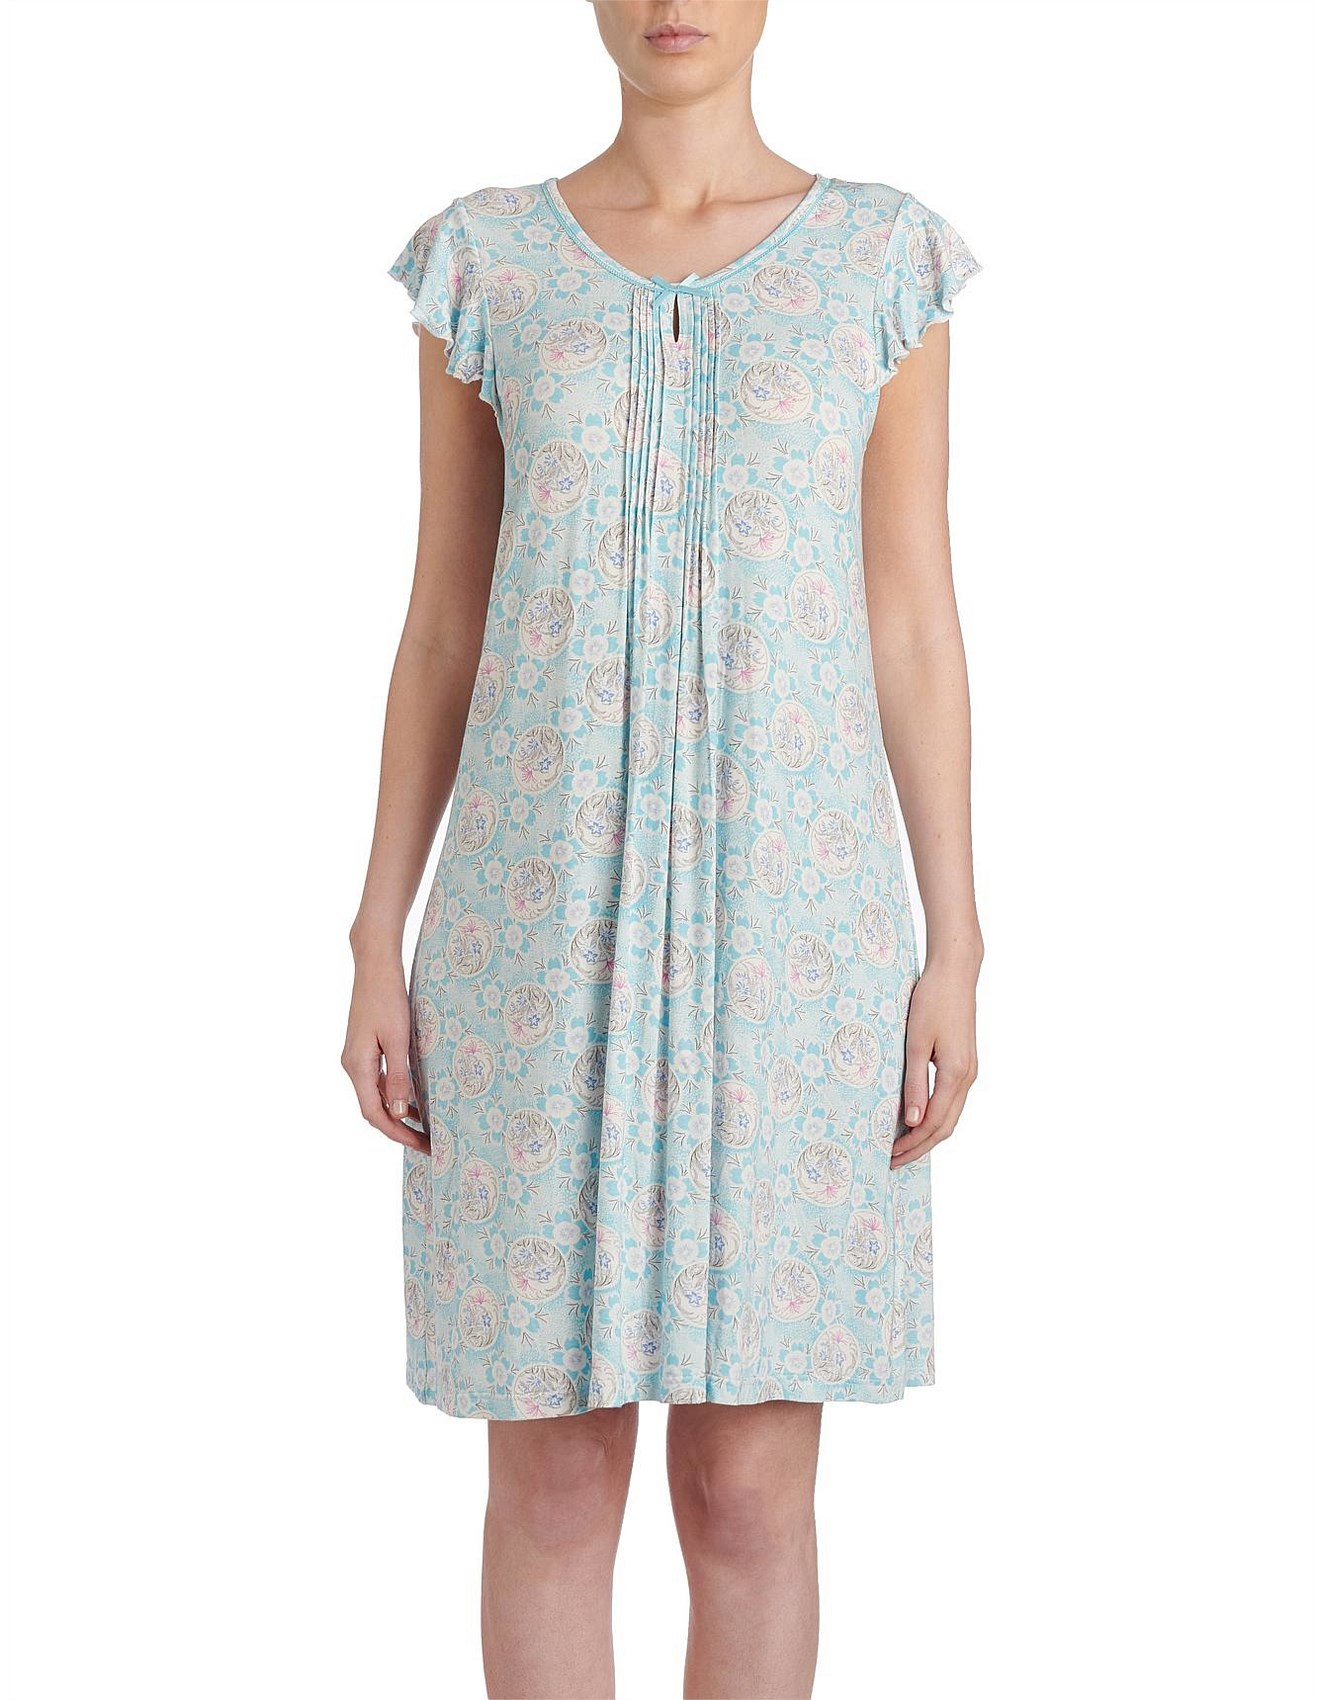 ba51d6036ad Intimates & Sleepwear - Anita Cap Sleeve Nightie